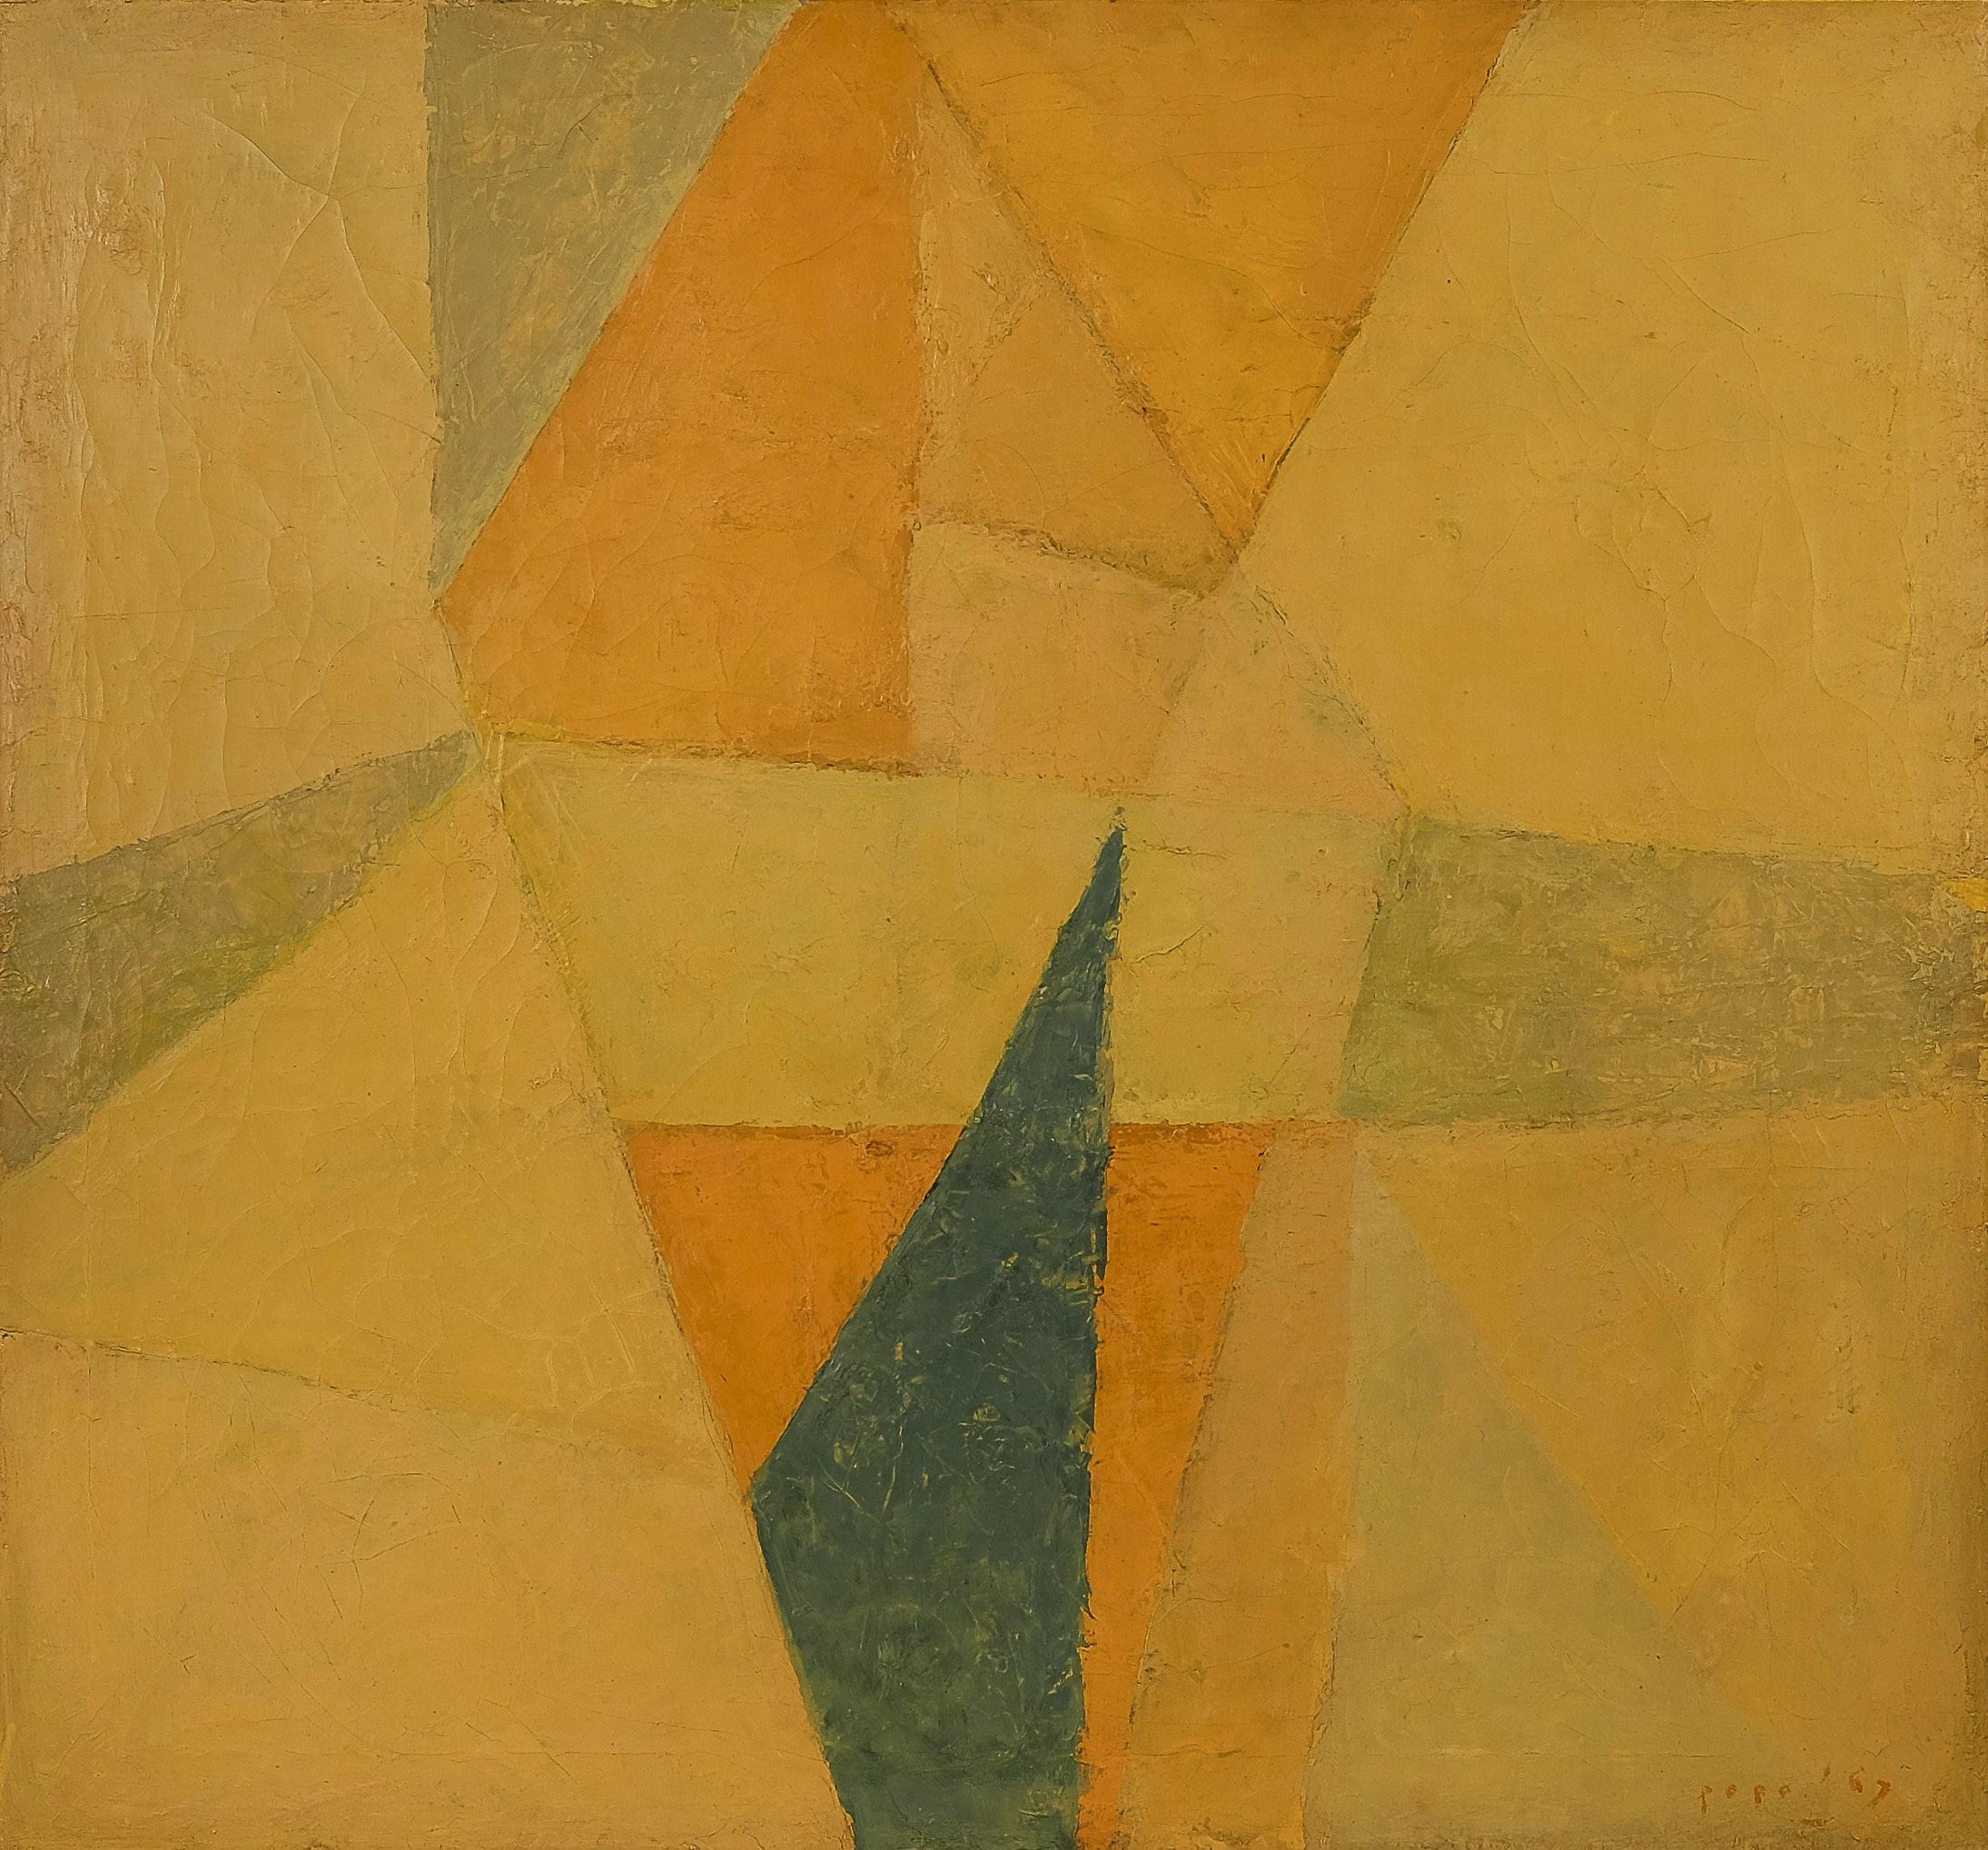 Popo Iskandar, Bunga Kuning (Yellow Flower), oil on canvas, 60 x 65 cm, 1967